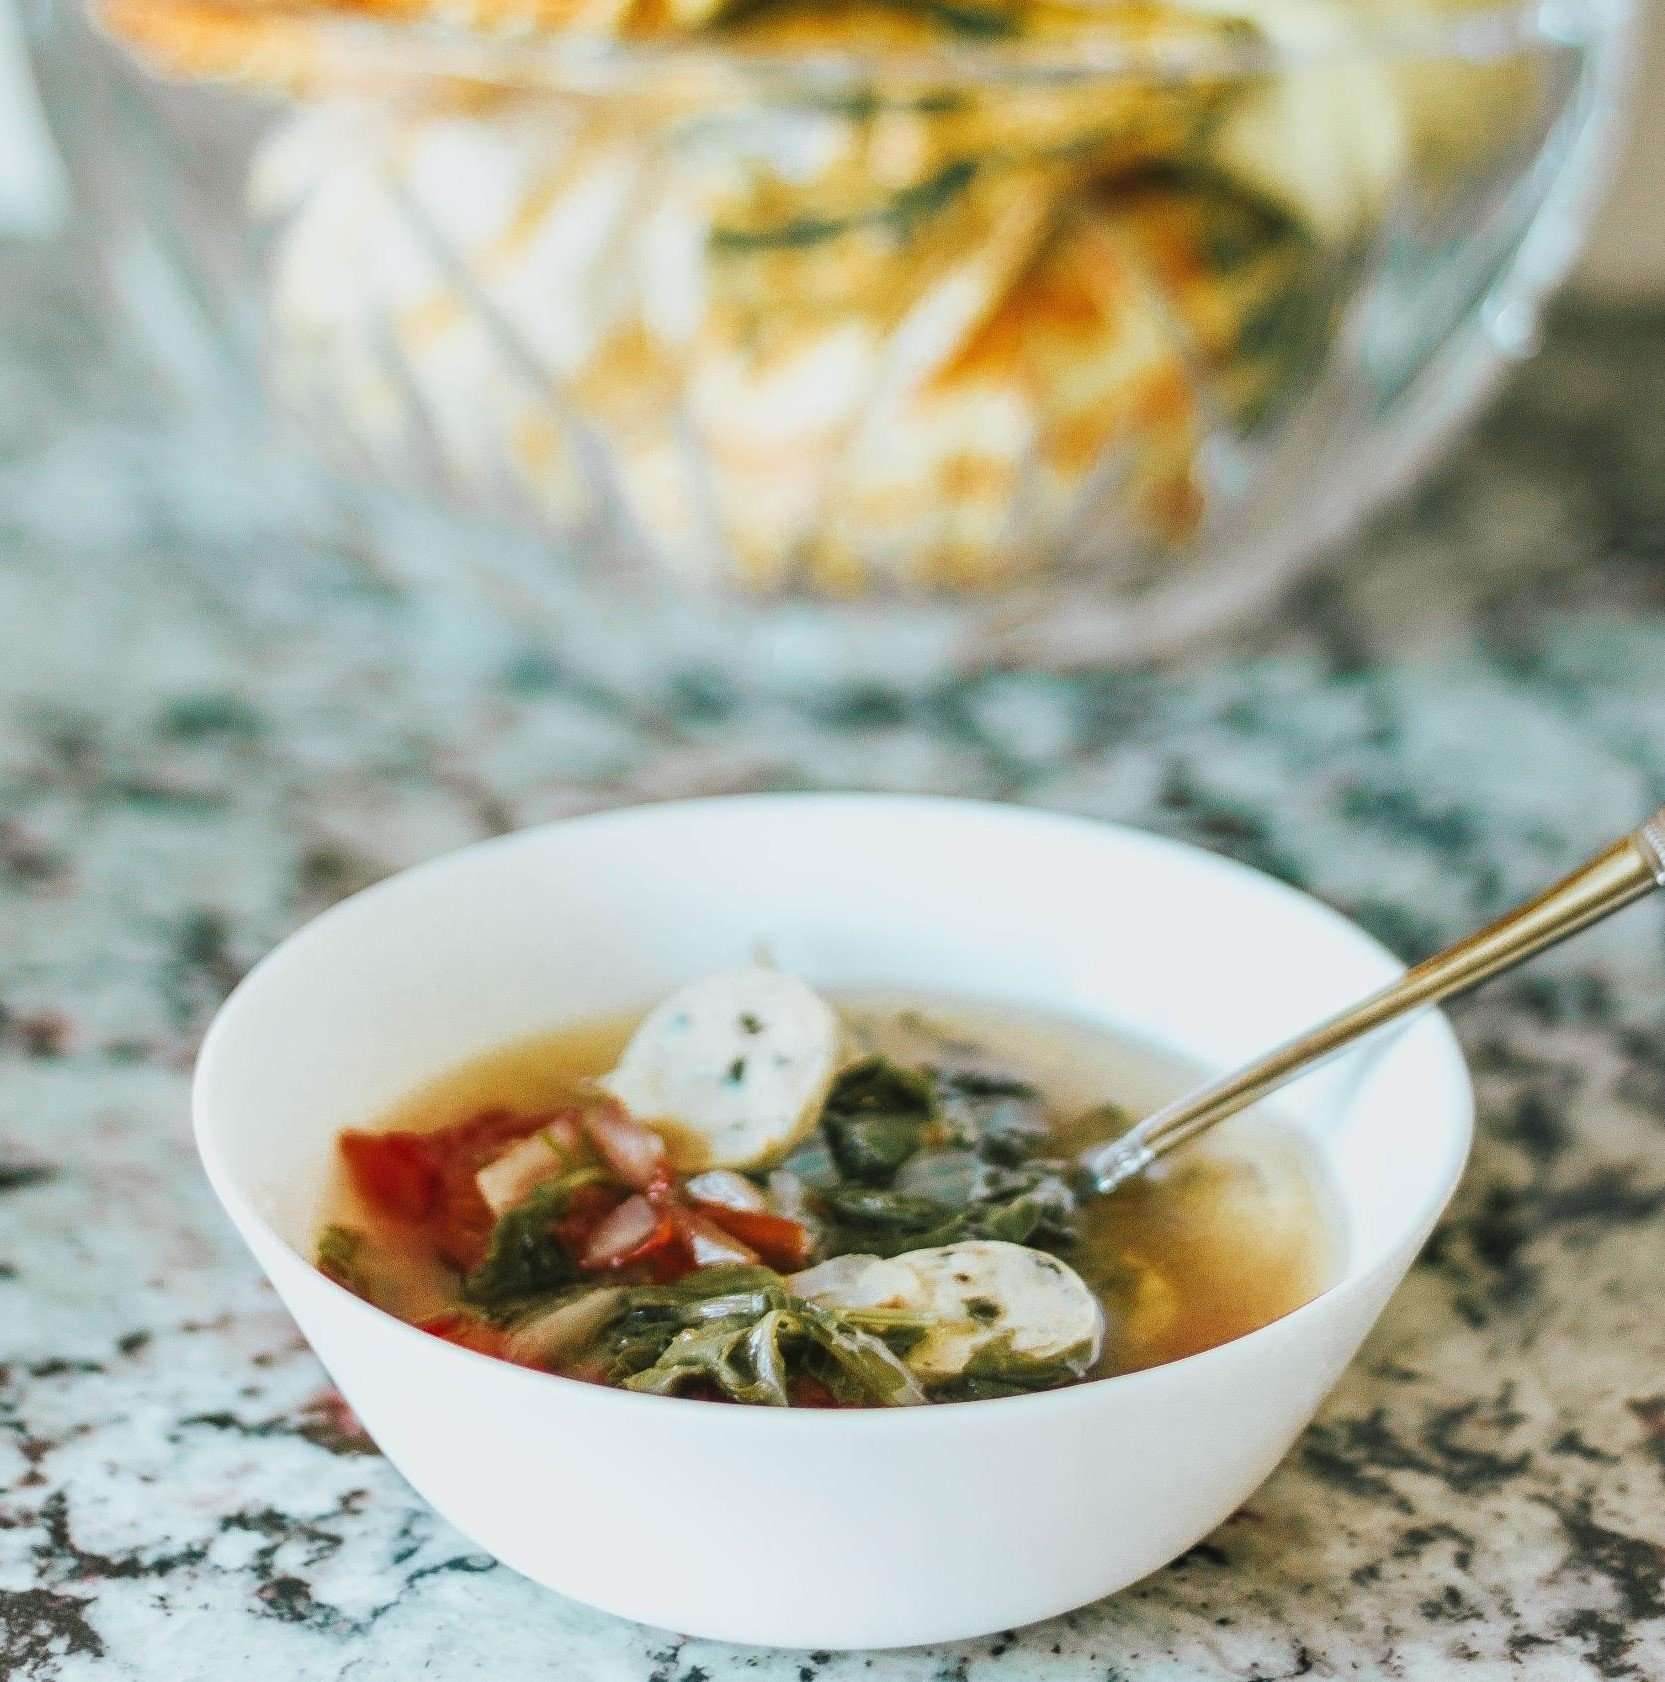 Healthy & Easy Chicken Sausage Soup